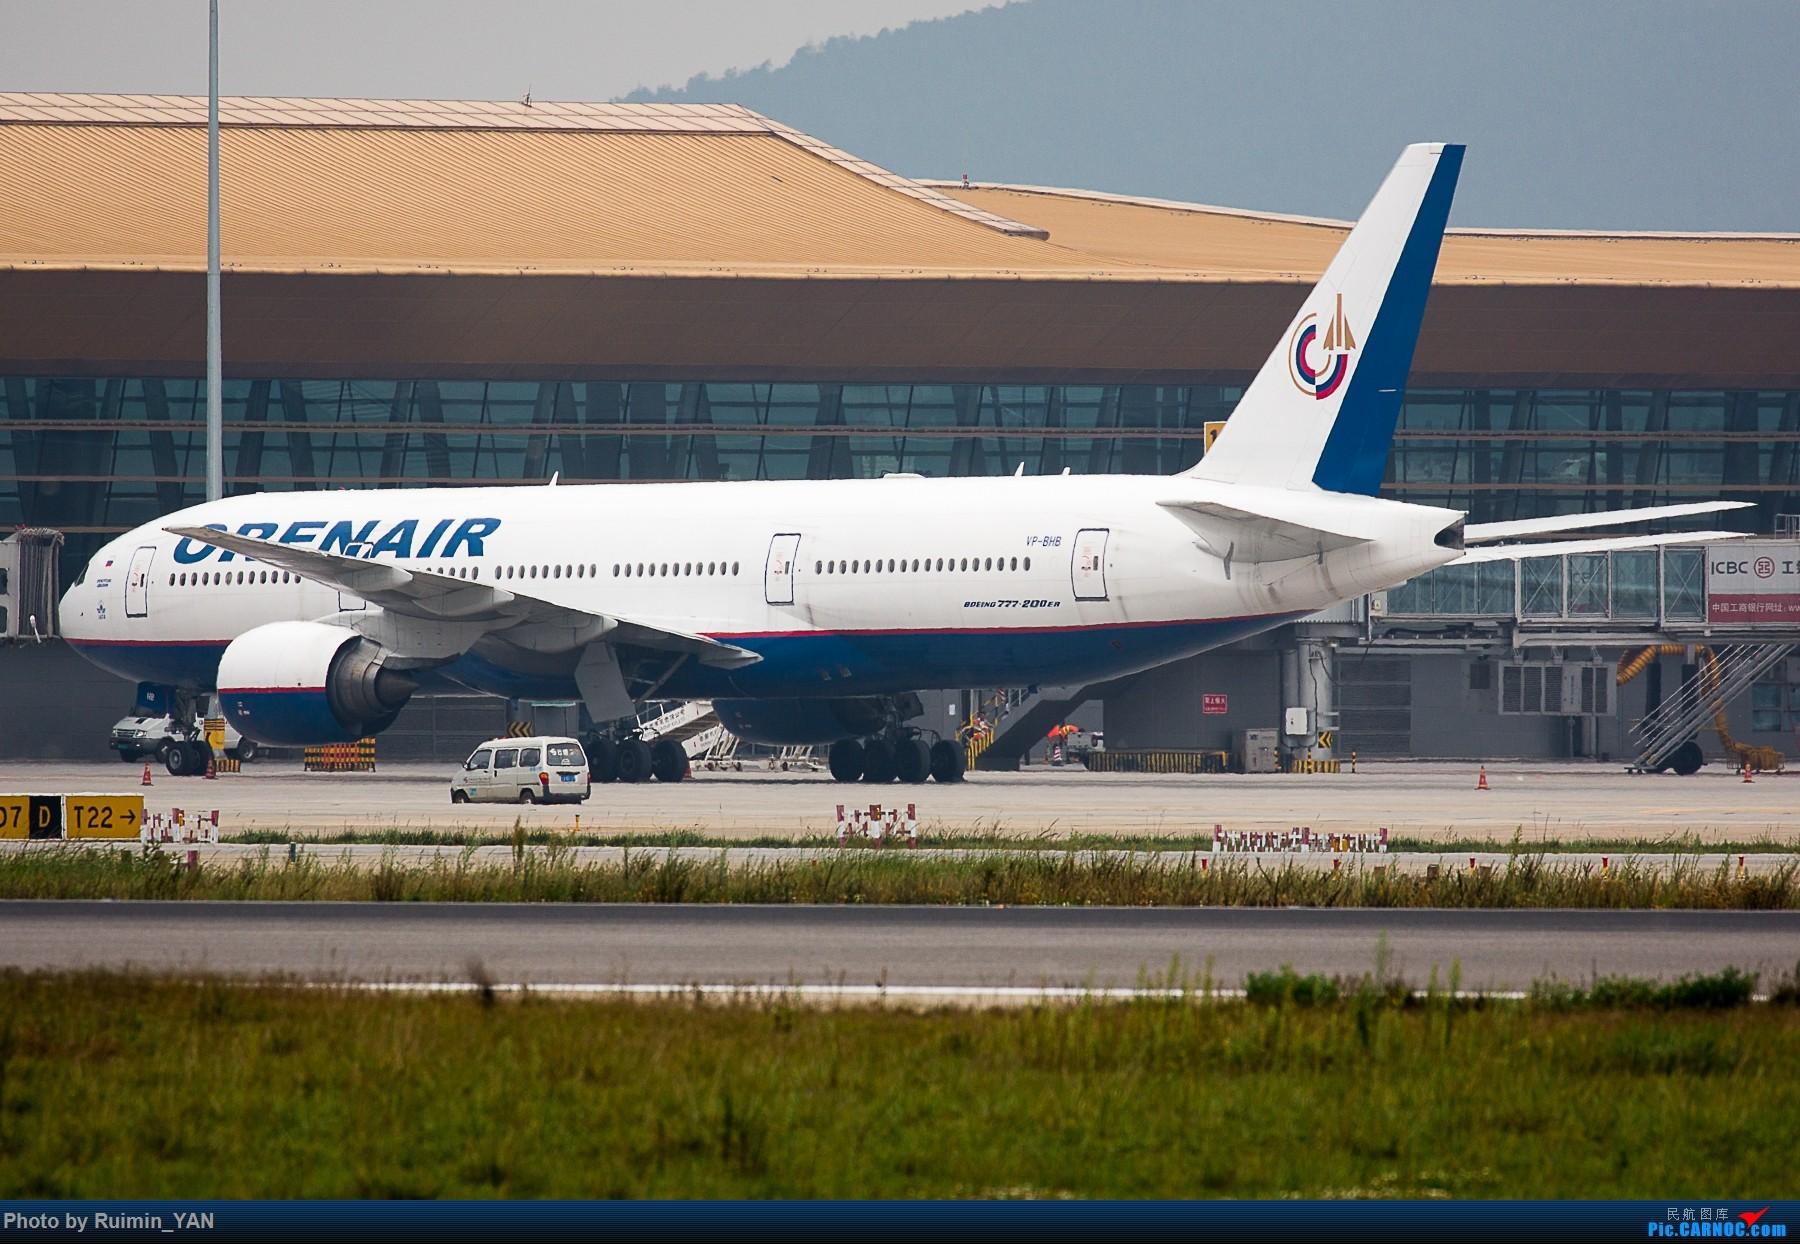 Re:【KMG飞友会】俄罗斯奥伦堡航空(Orenburg Airlines,R2337)